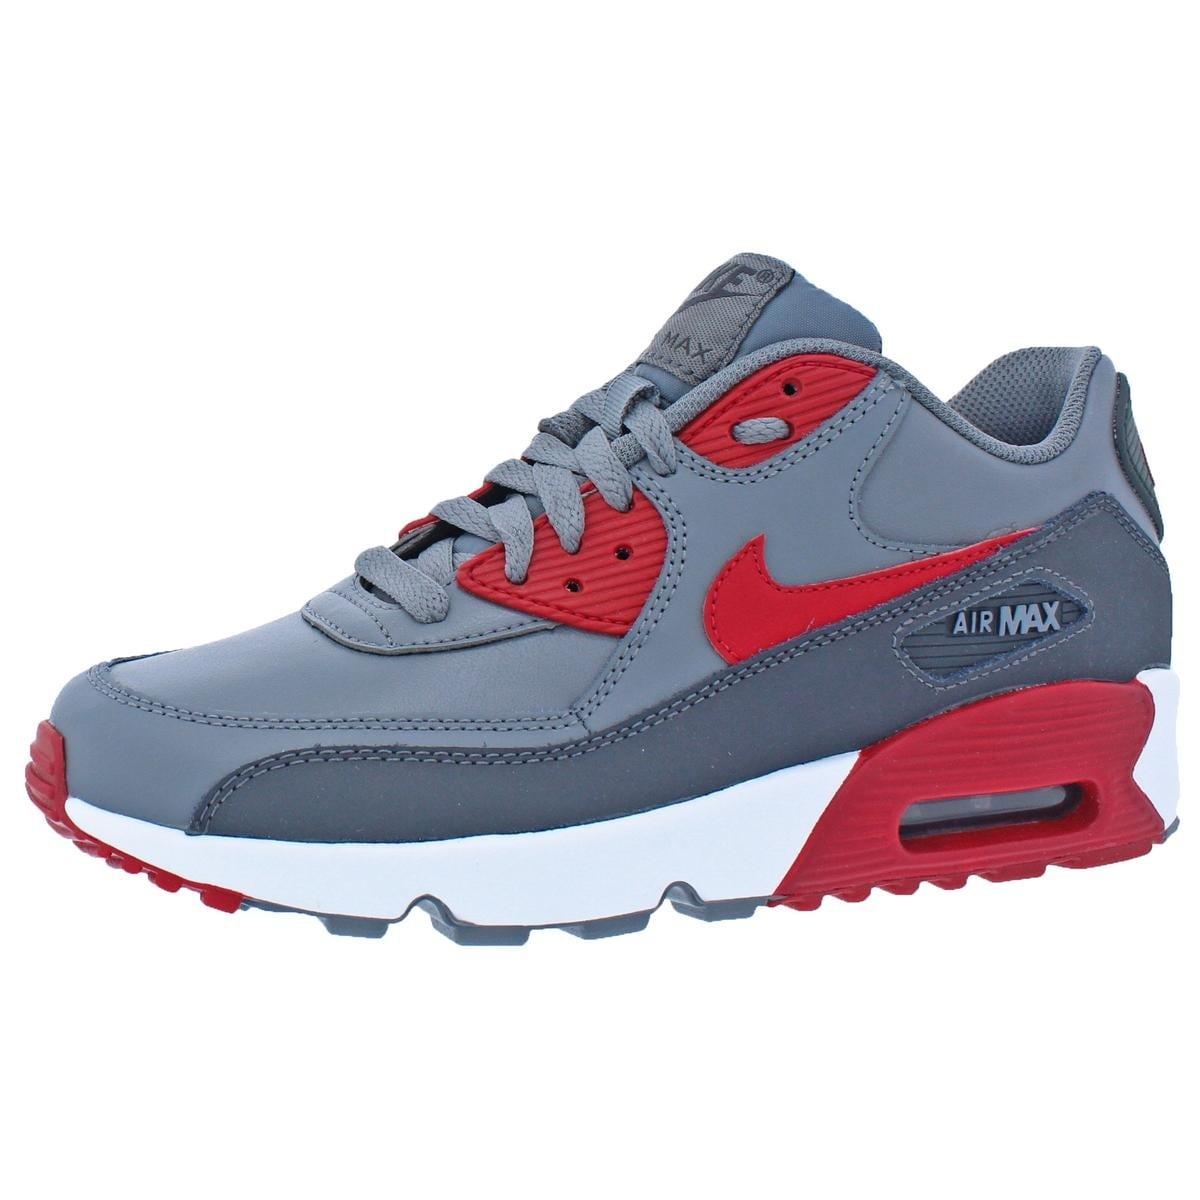 Nike Boys Air Max 90 LTR Running Shoes